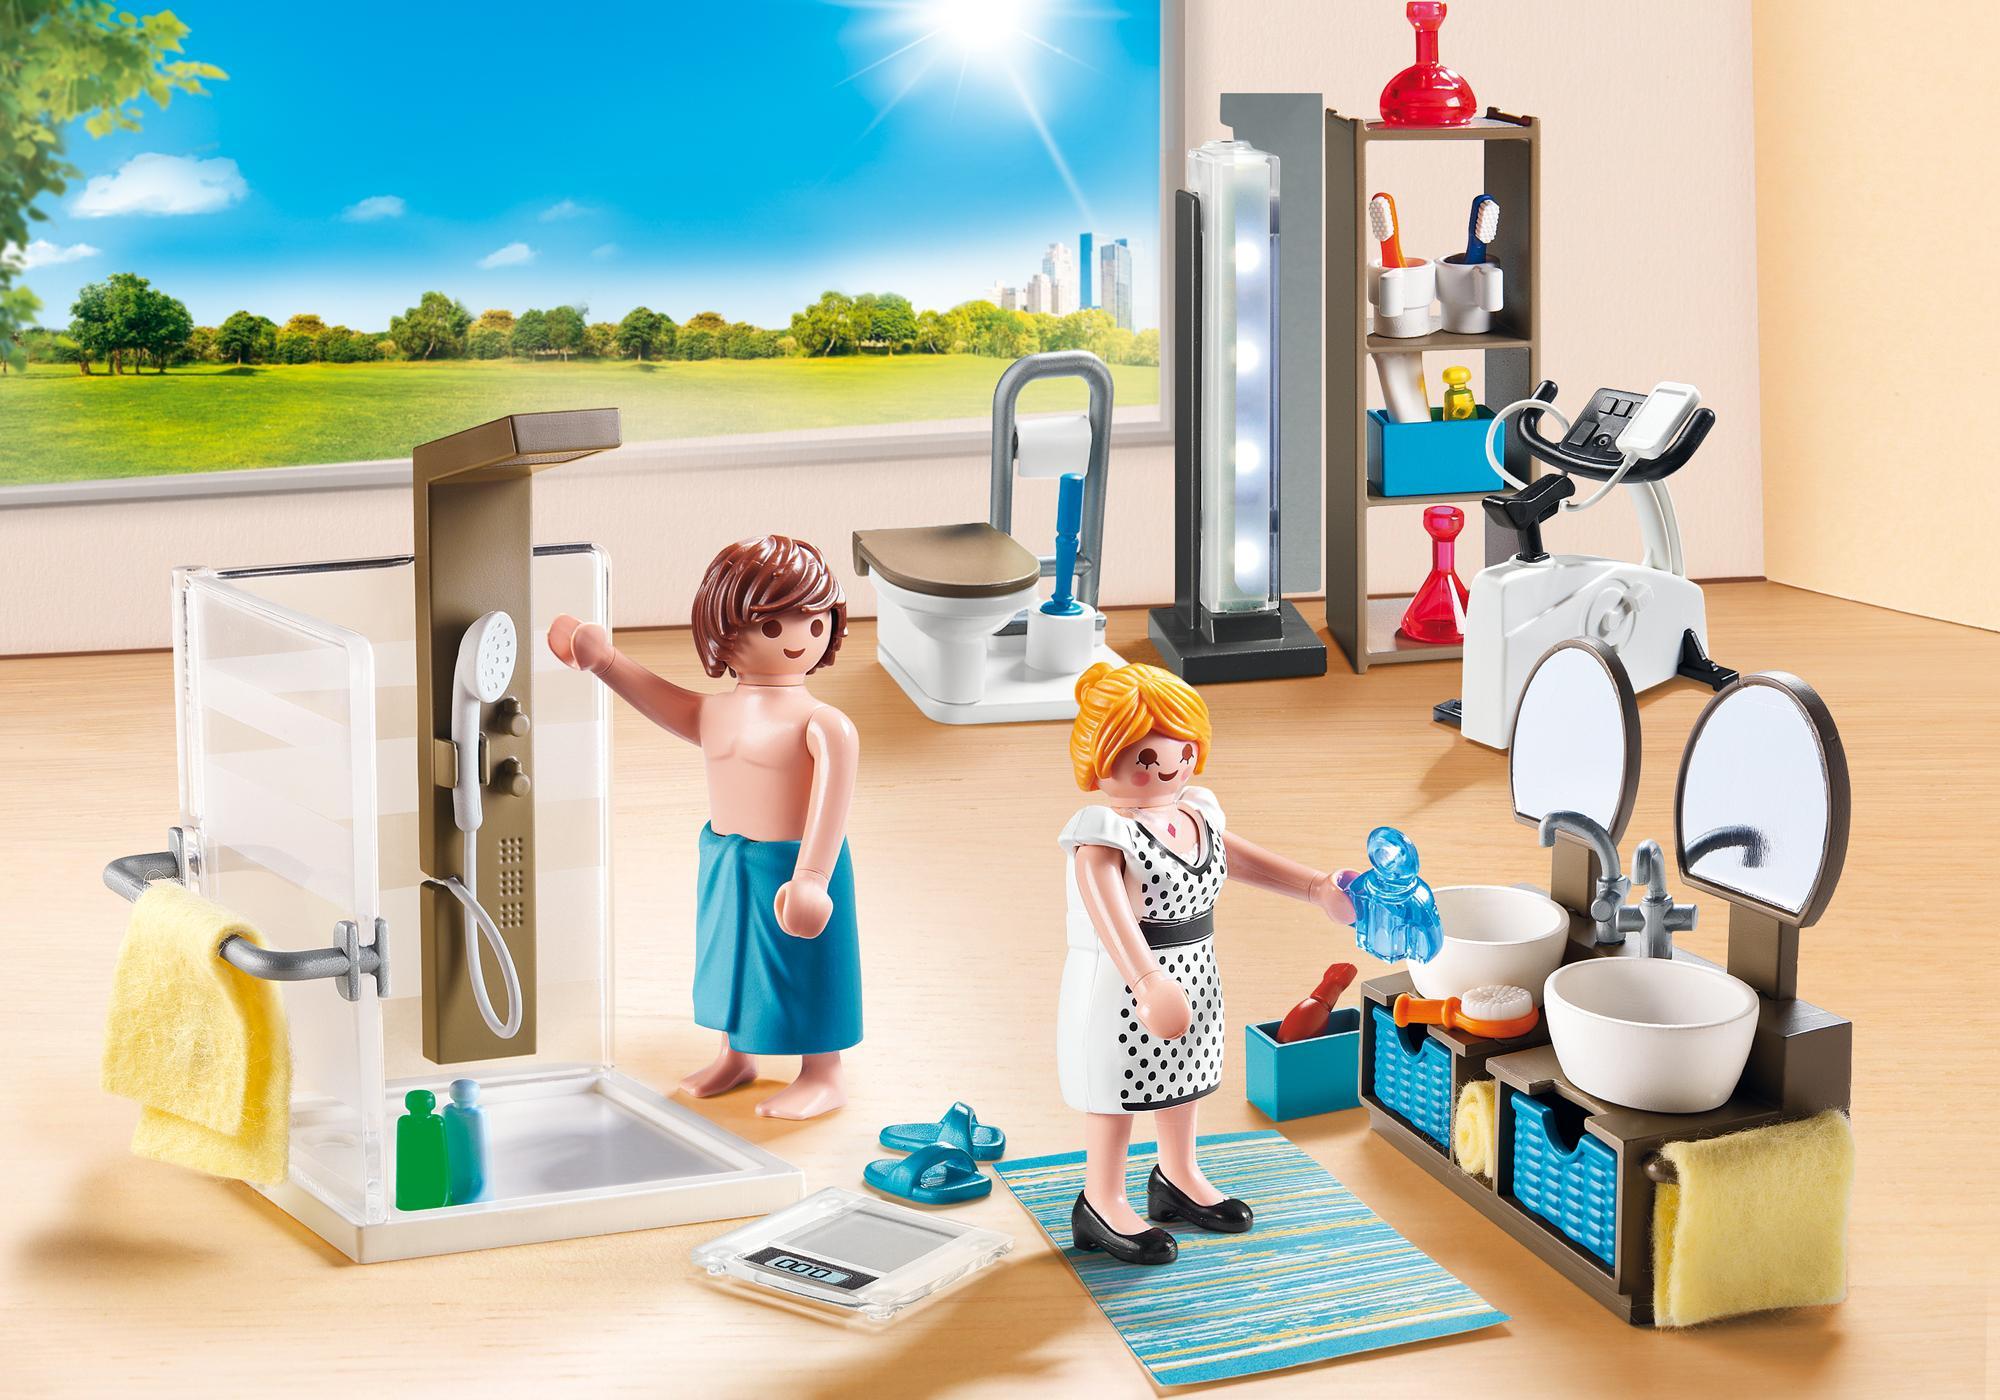 Salle De Bain Playmobil ~ salle de bain avec douche l italienne 9268 playmobil belgi